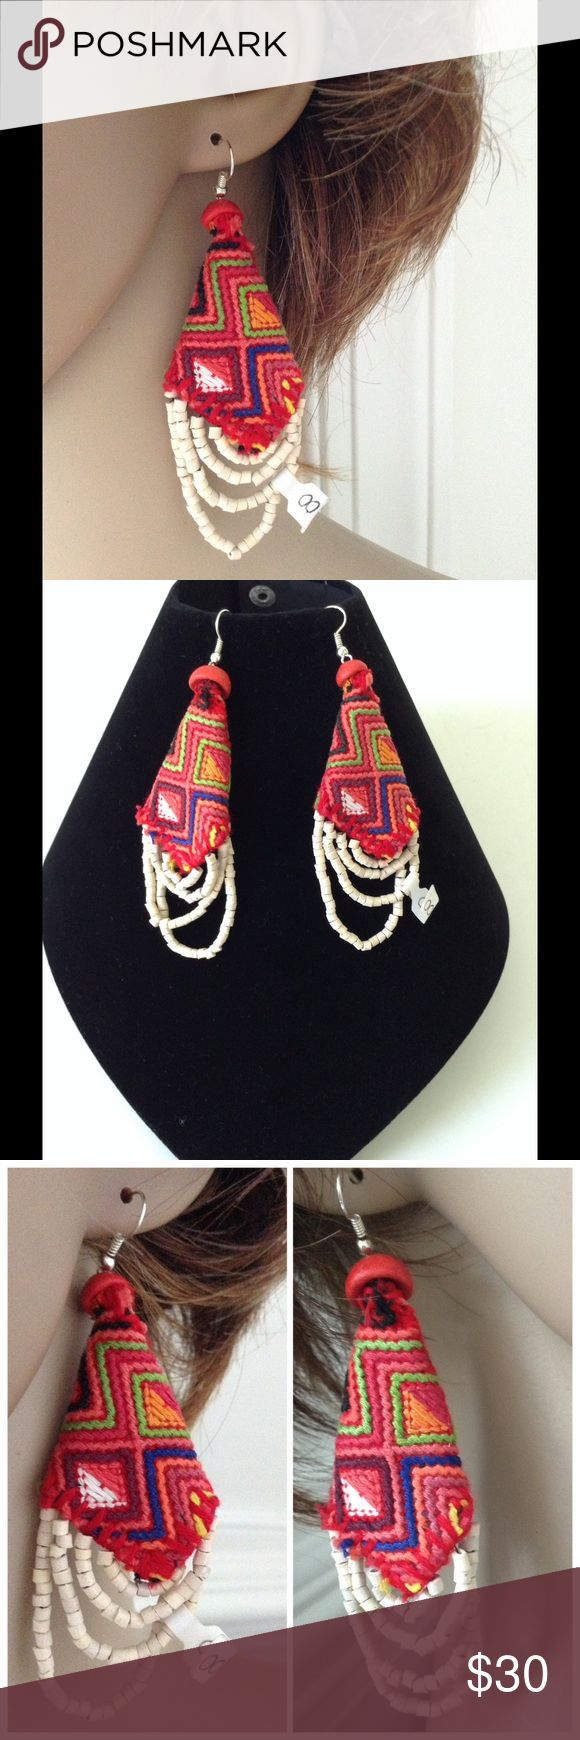 EMBODIED TAPESTRY CONE CASCADE BOBO EARRINGS Guatemalan's hand made tapestry 100% cotton yield- thread multicolor Tapestry cone & white beads Cascade boho hippie style earrings, fish hook earring claps, nickel free unknow  Jewelry Earrings